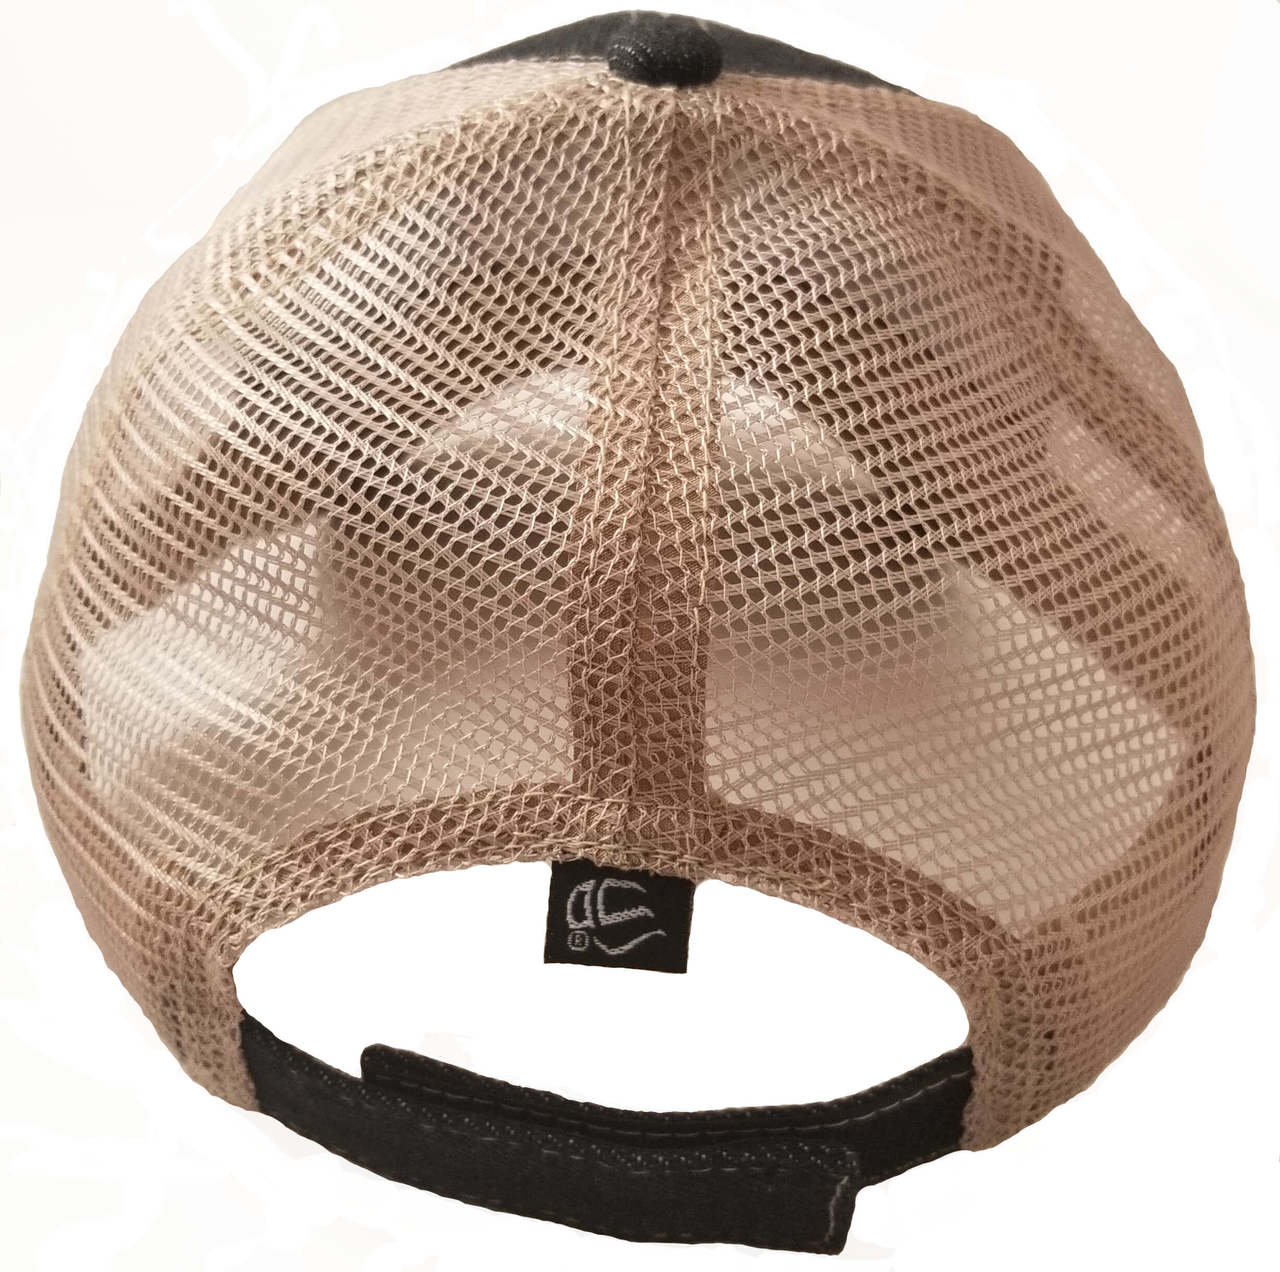 Bluegrass Hive & Honey Baseball Cap Back